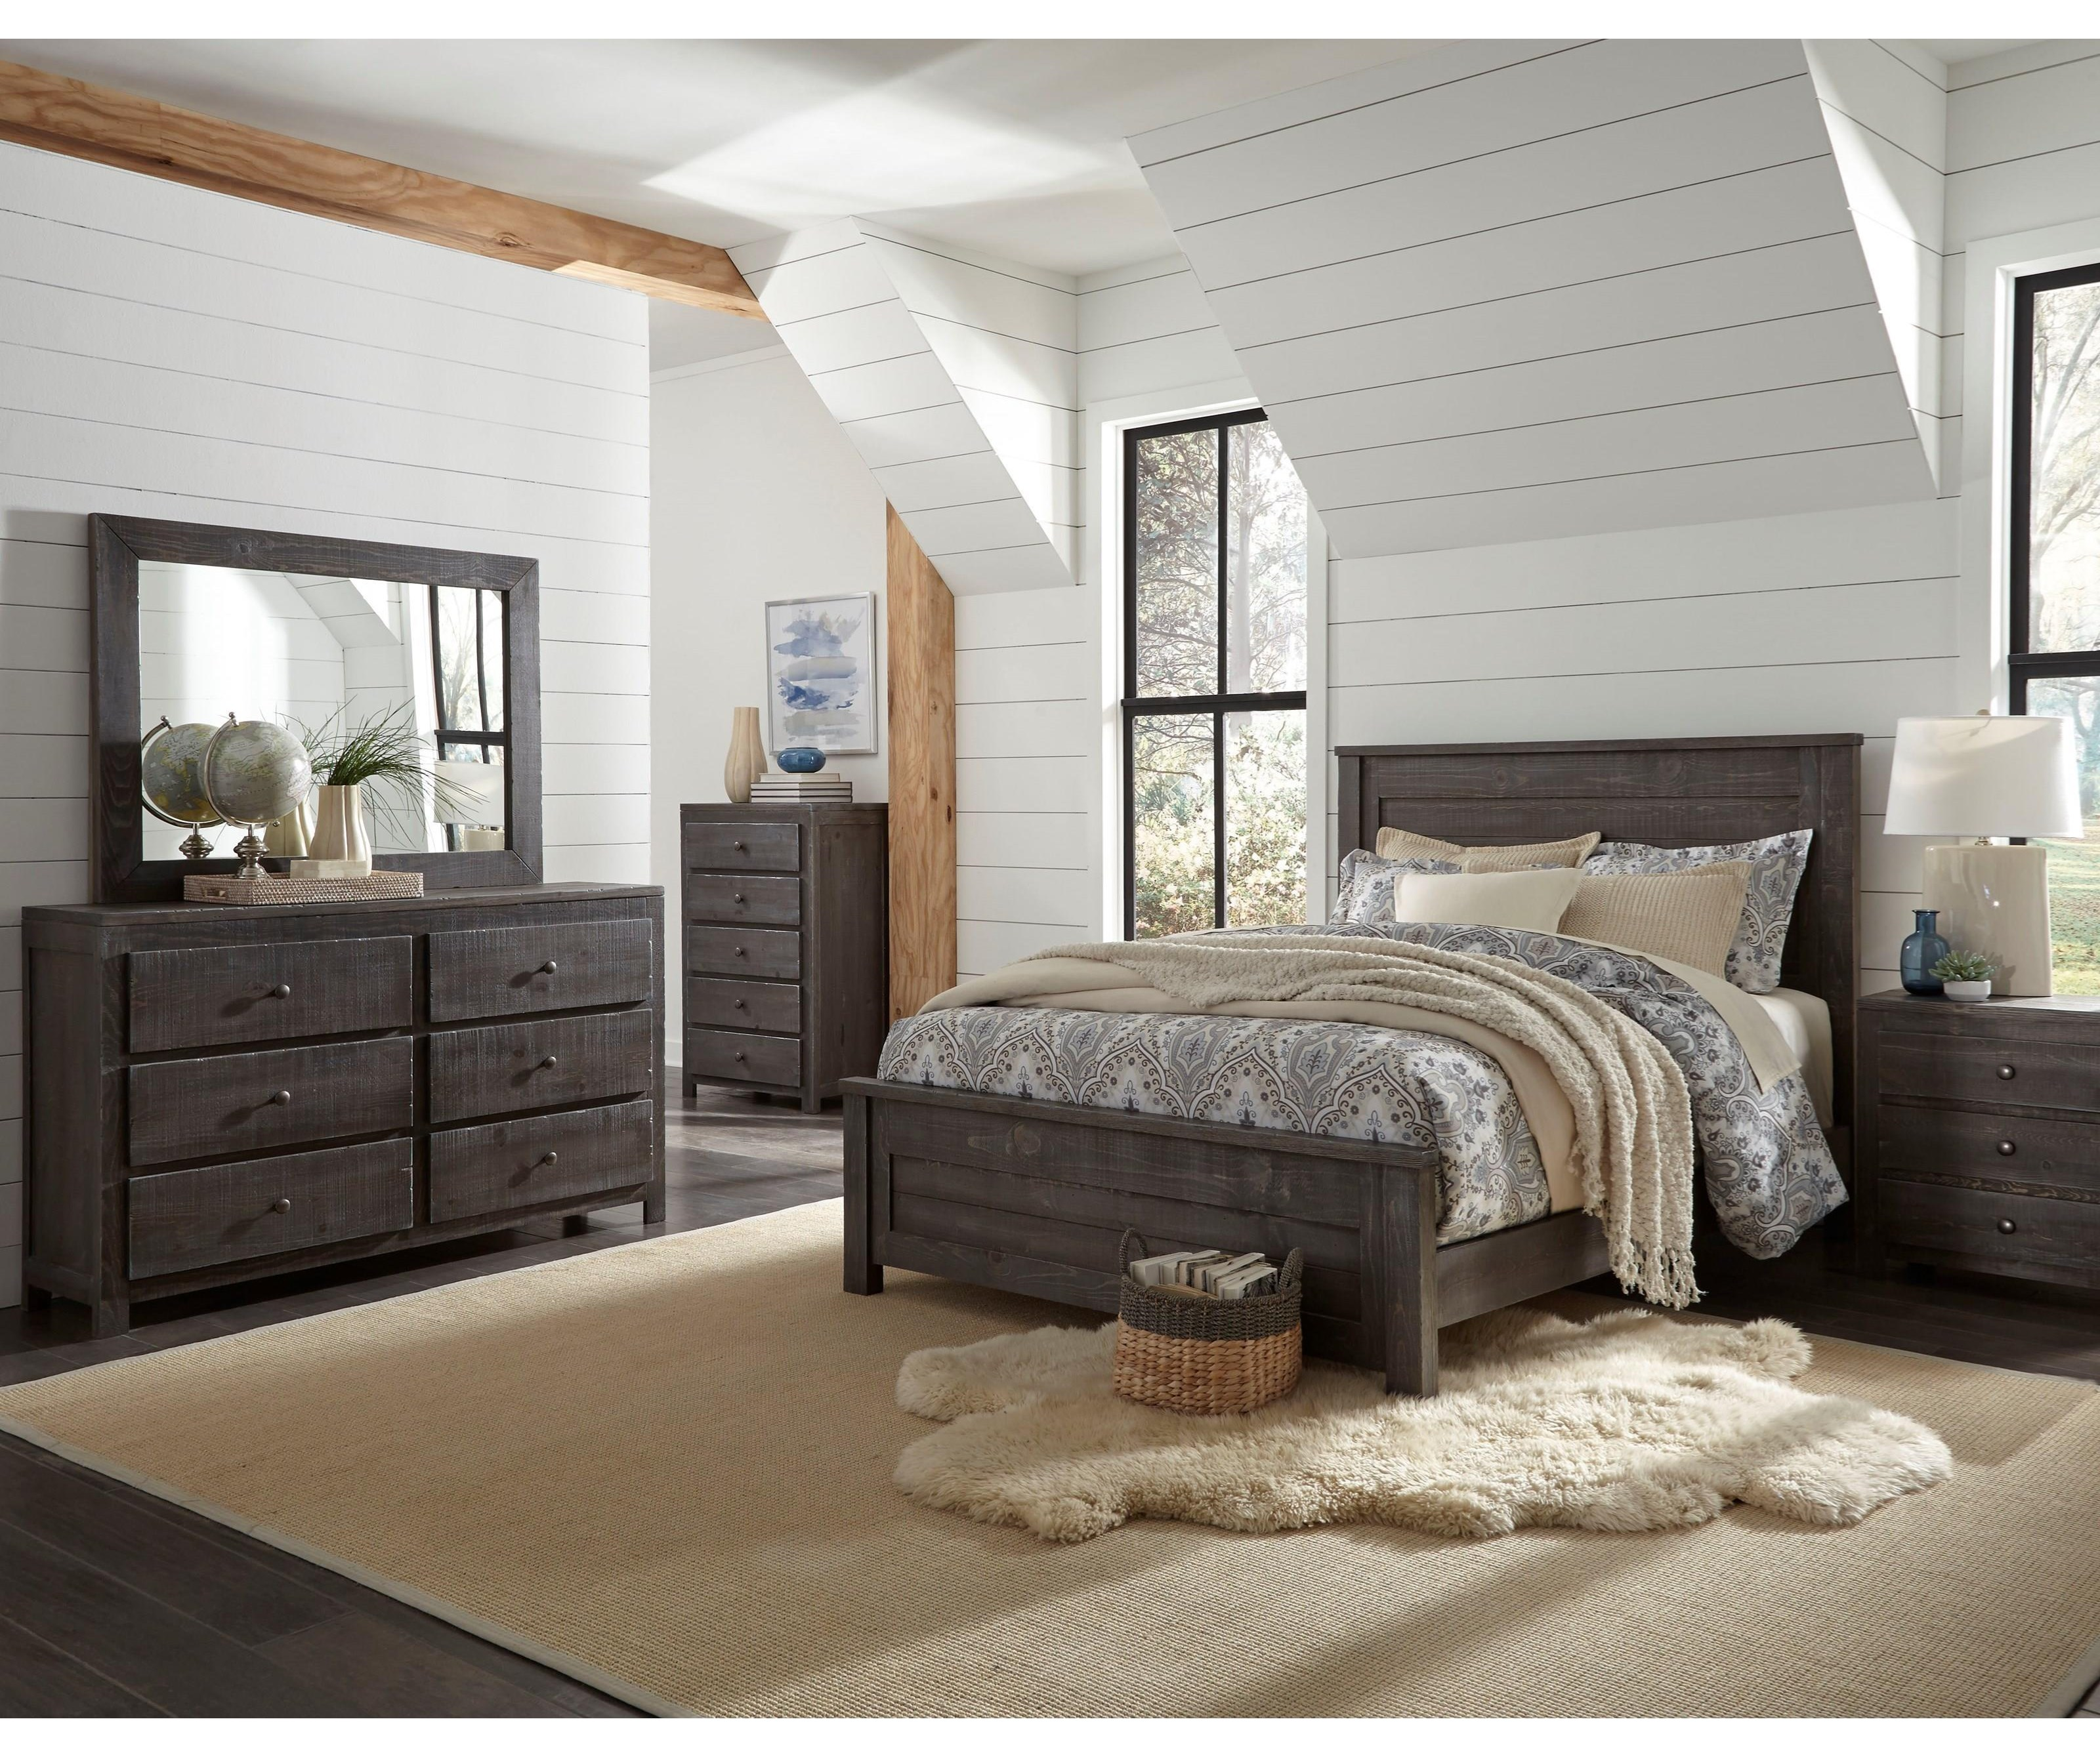 Wheaton 4 Piece Full Bedroom Set by Progressive Furniture at Sam Levitz Furniture